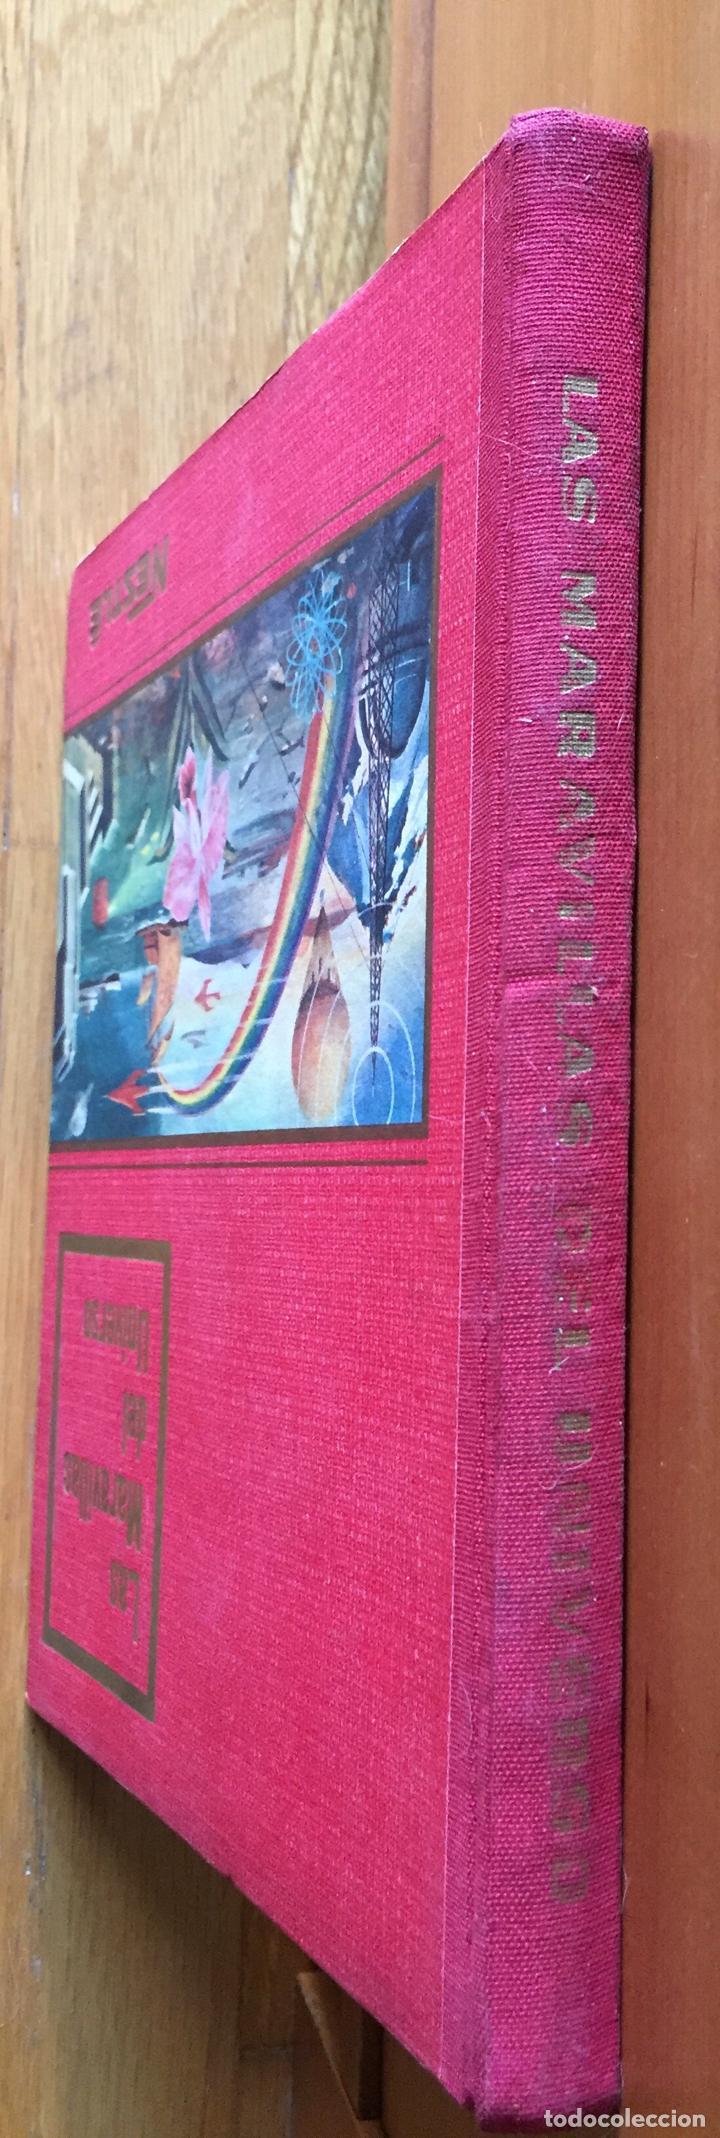 Coleccionismo Álbum: LAS MARAVILLAS DEL UNIVERSO, NESTLE Completo - Foto 2 - 194205625